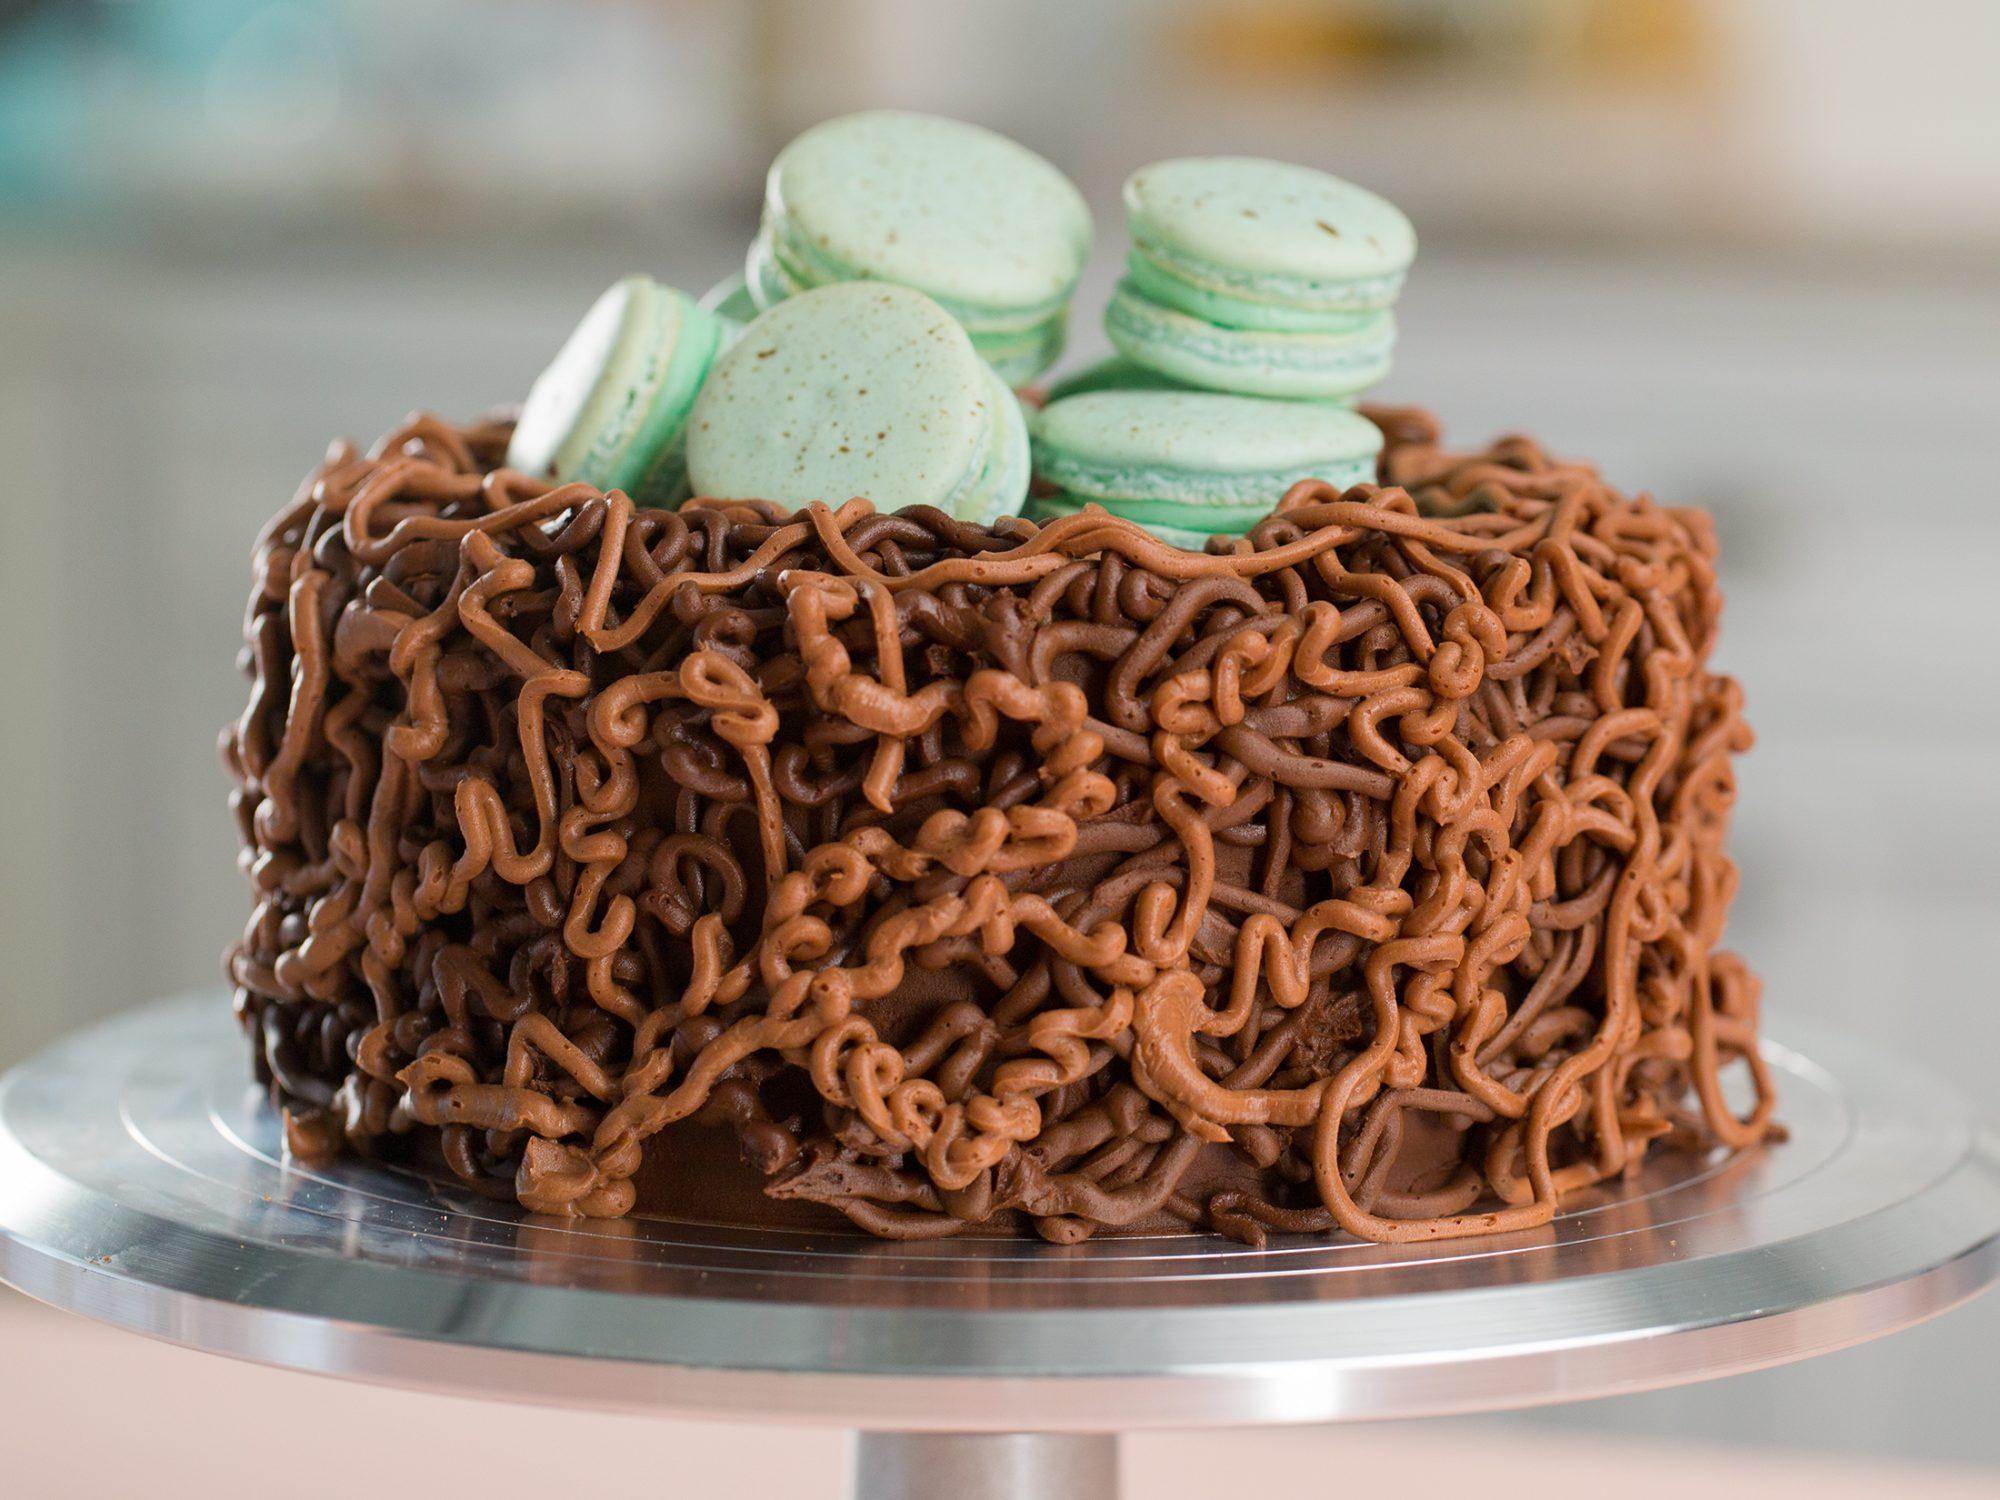 Speckled Egg Nest Cake image